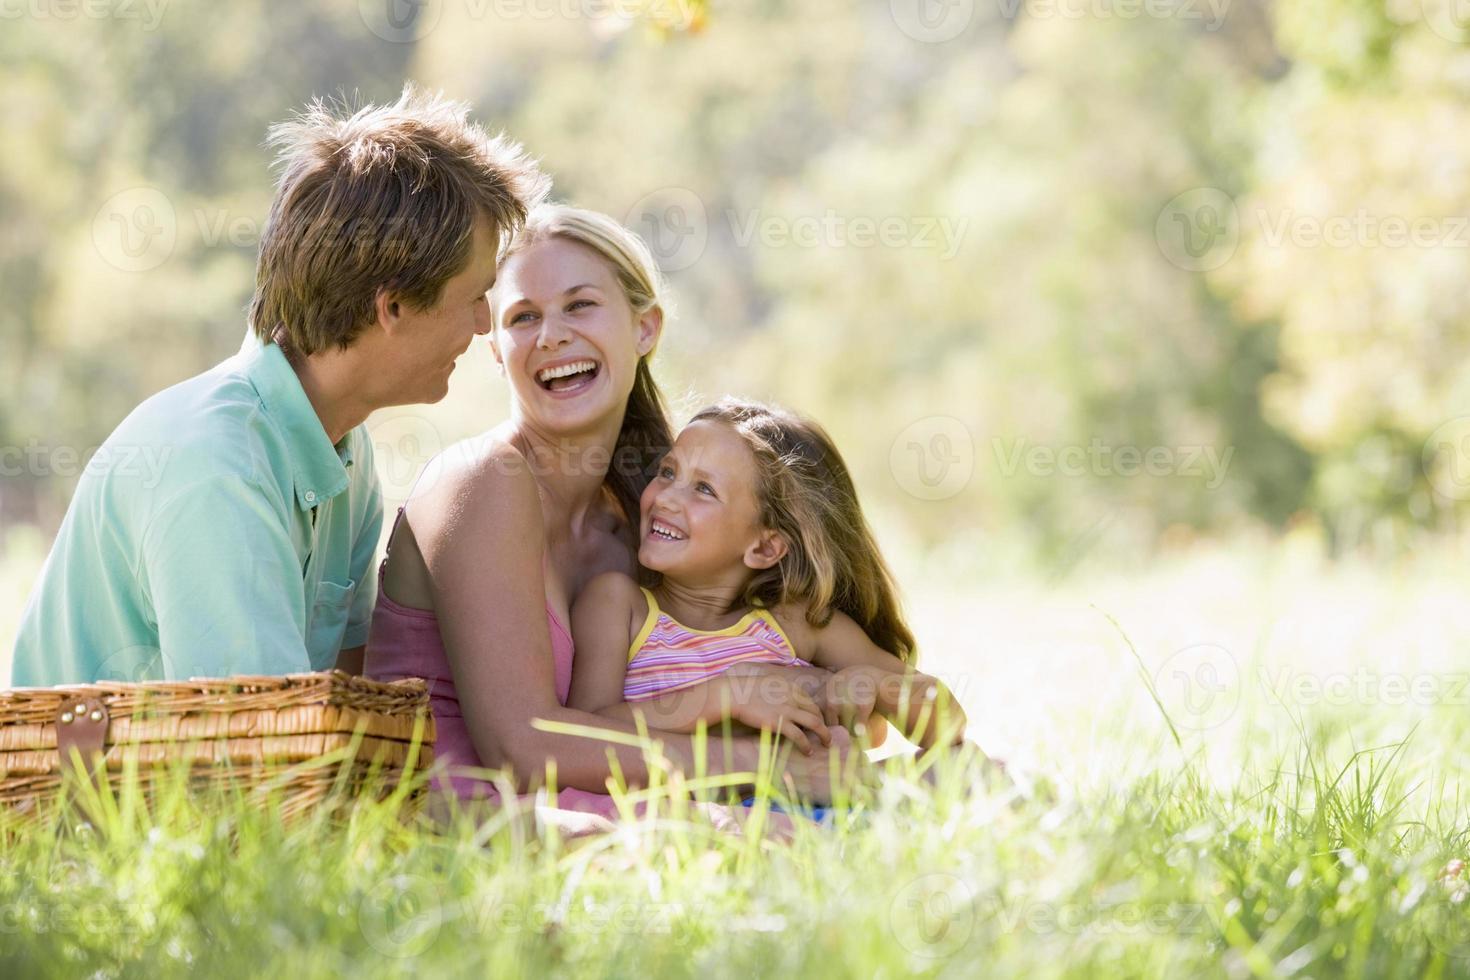 familie in park met picknick foto